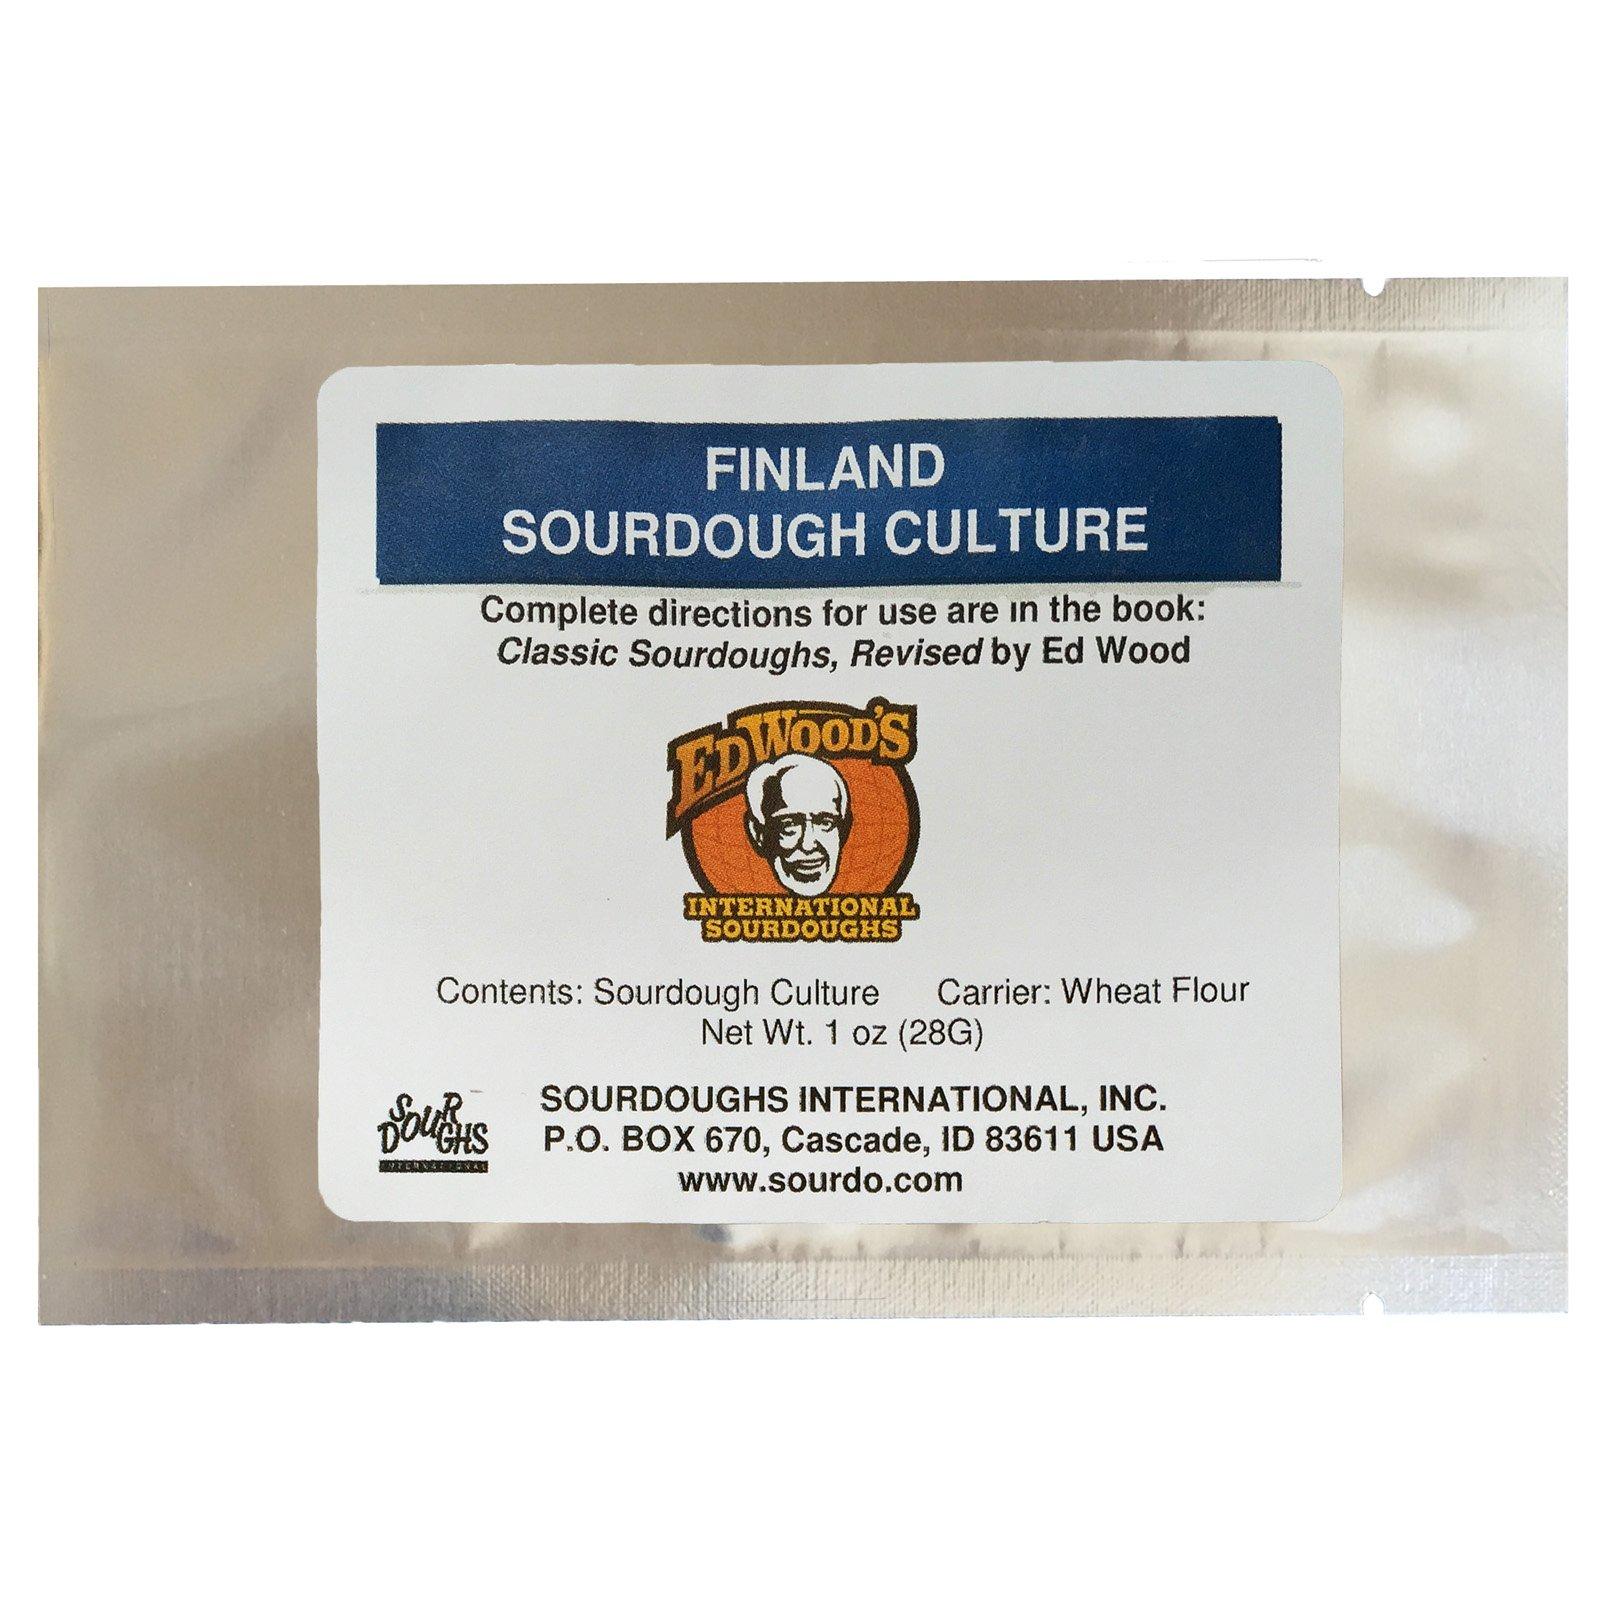 Finland Sourdough Culture by Ed Wood